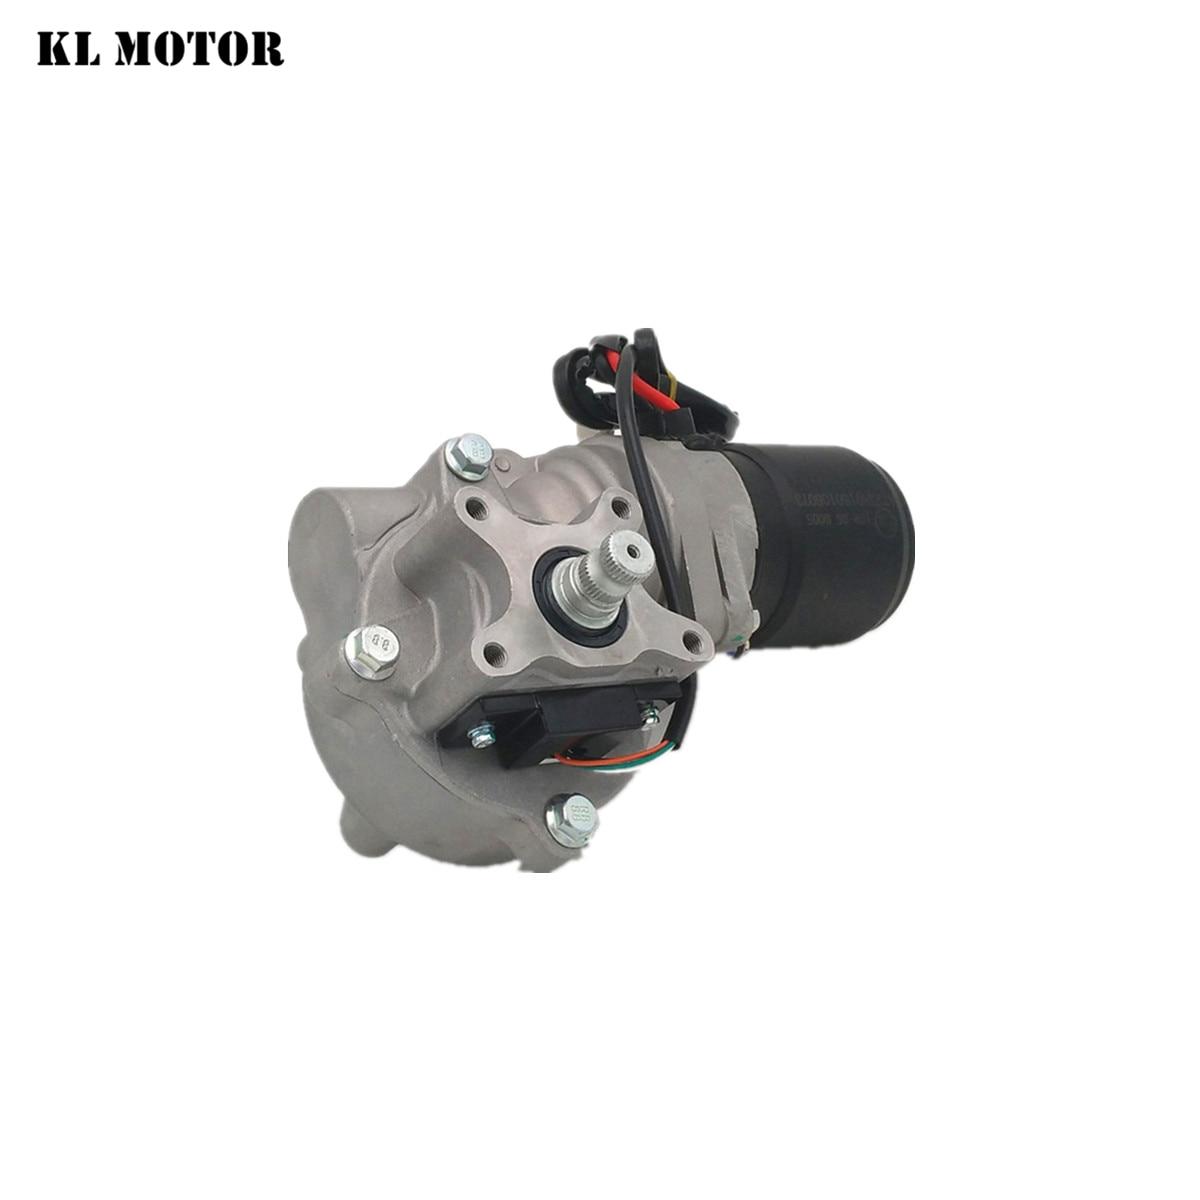 EPS ELECTRIC POWER STEERING ATV CF500 CF Moto X5 cfmoto Direction controller EFI QUAD ATV UTV PARTS Paeps 7002 enlarge